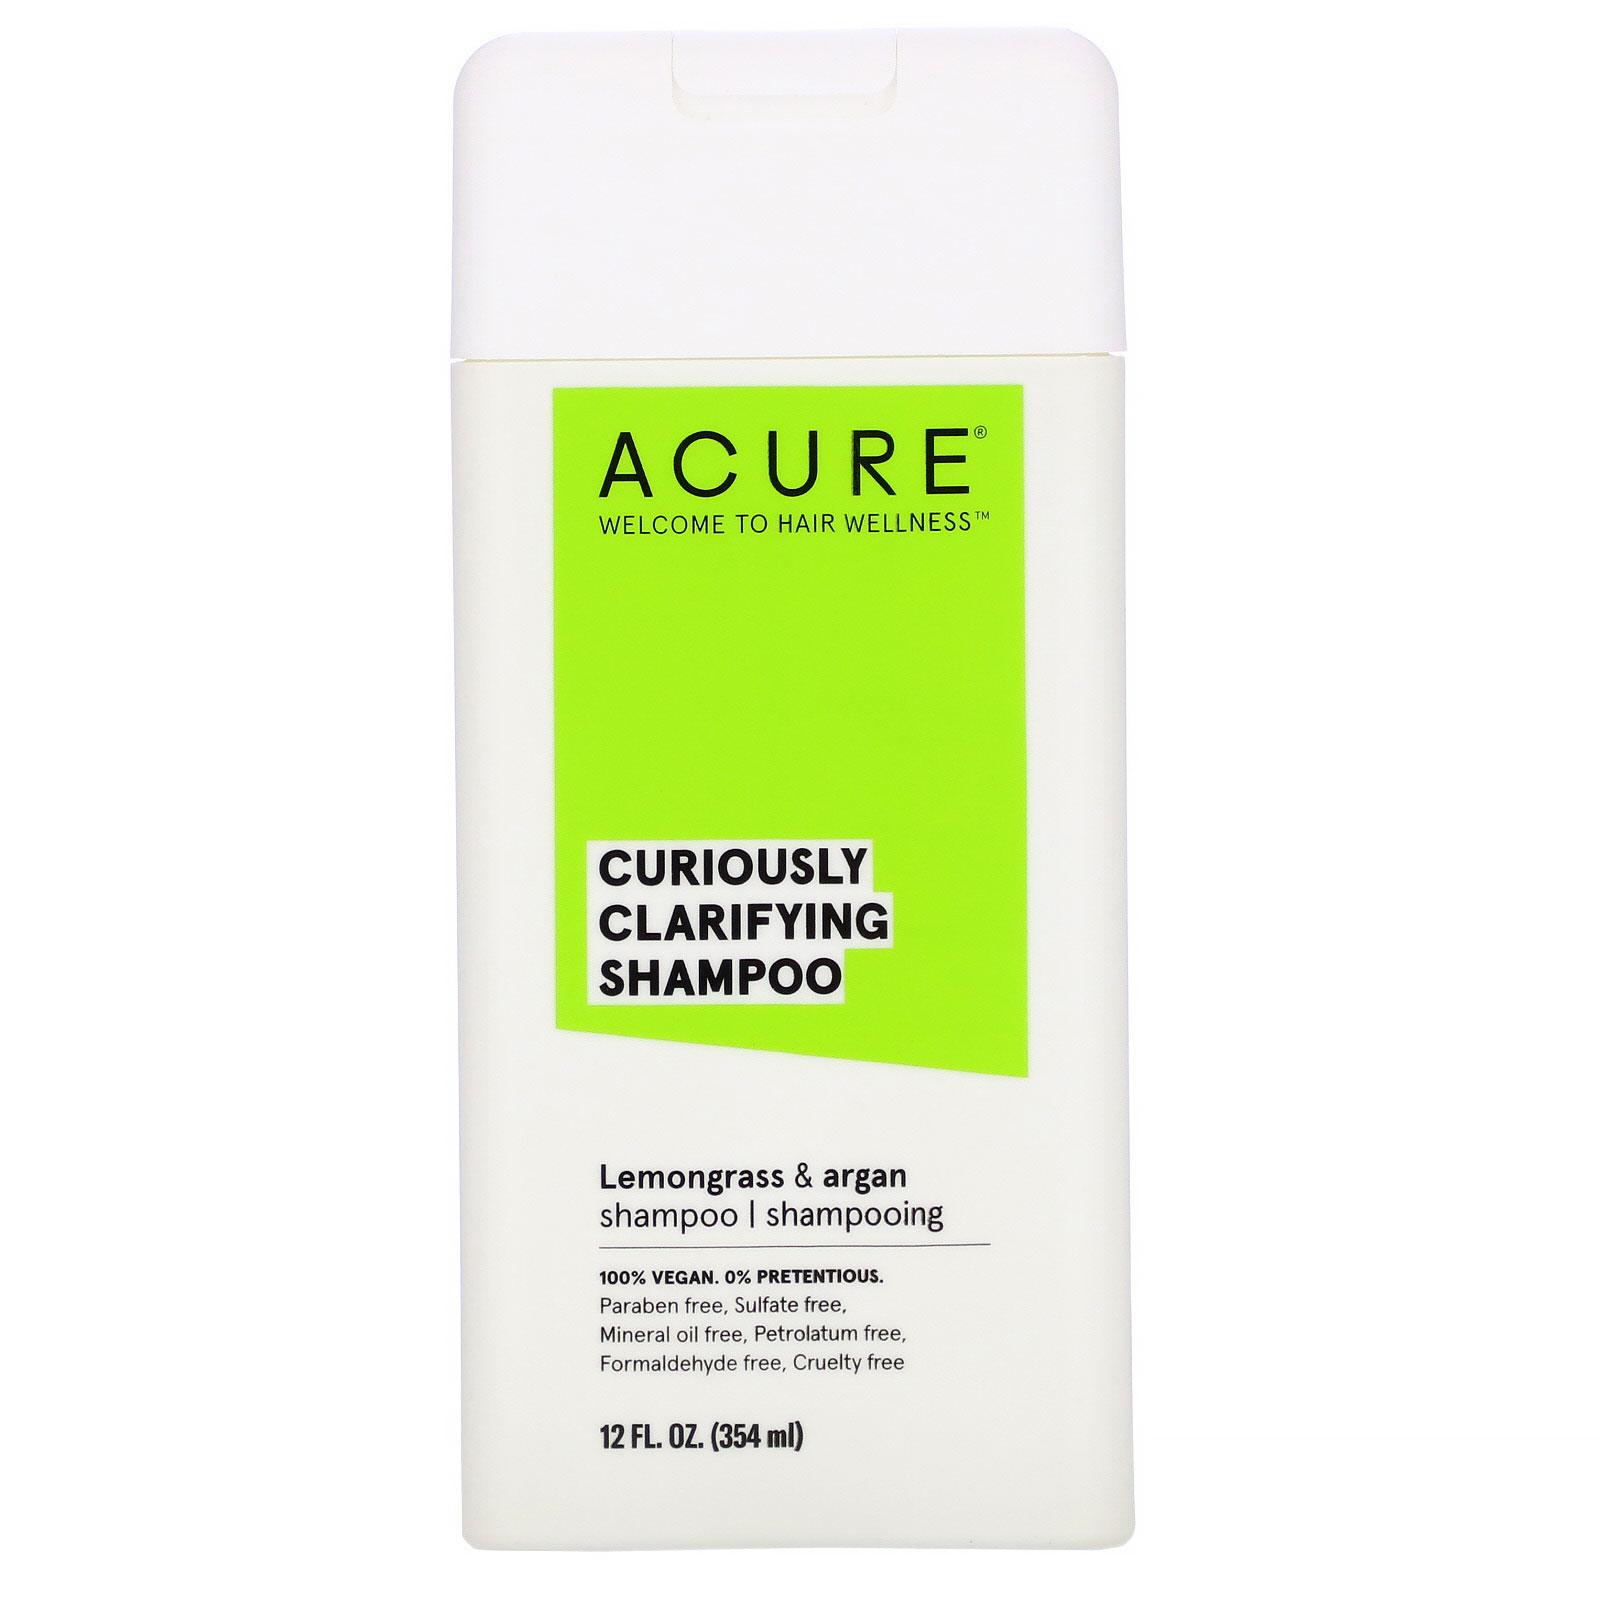 Acure, Curiously Clarifying Shampoo, Lemongrass & Argan